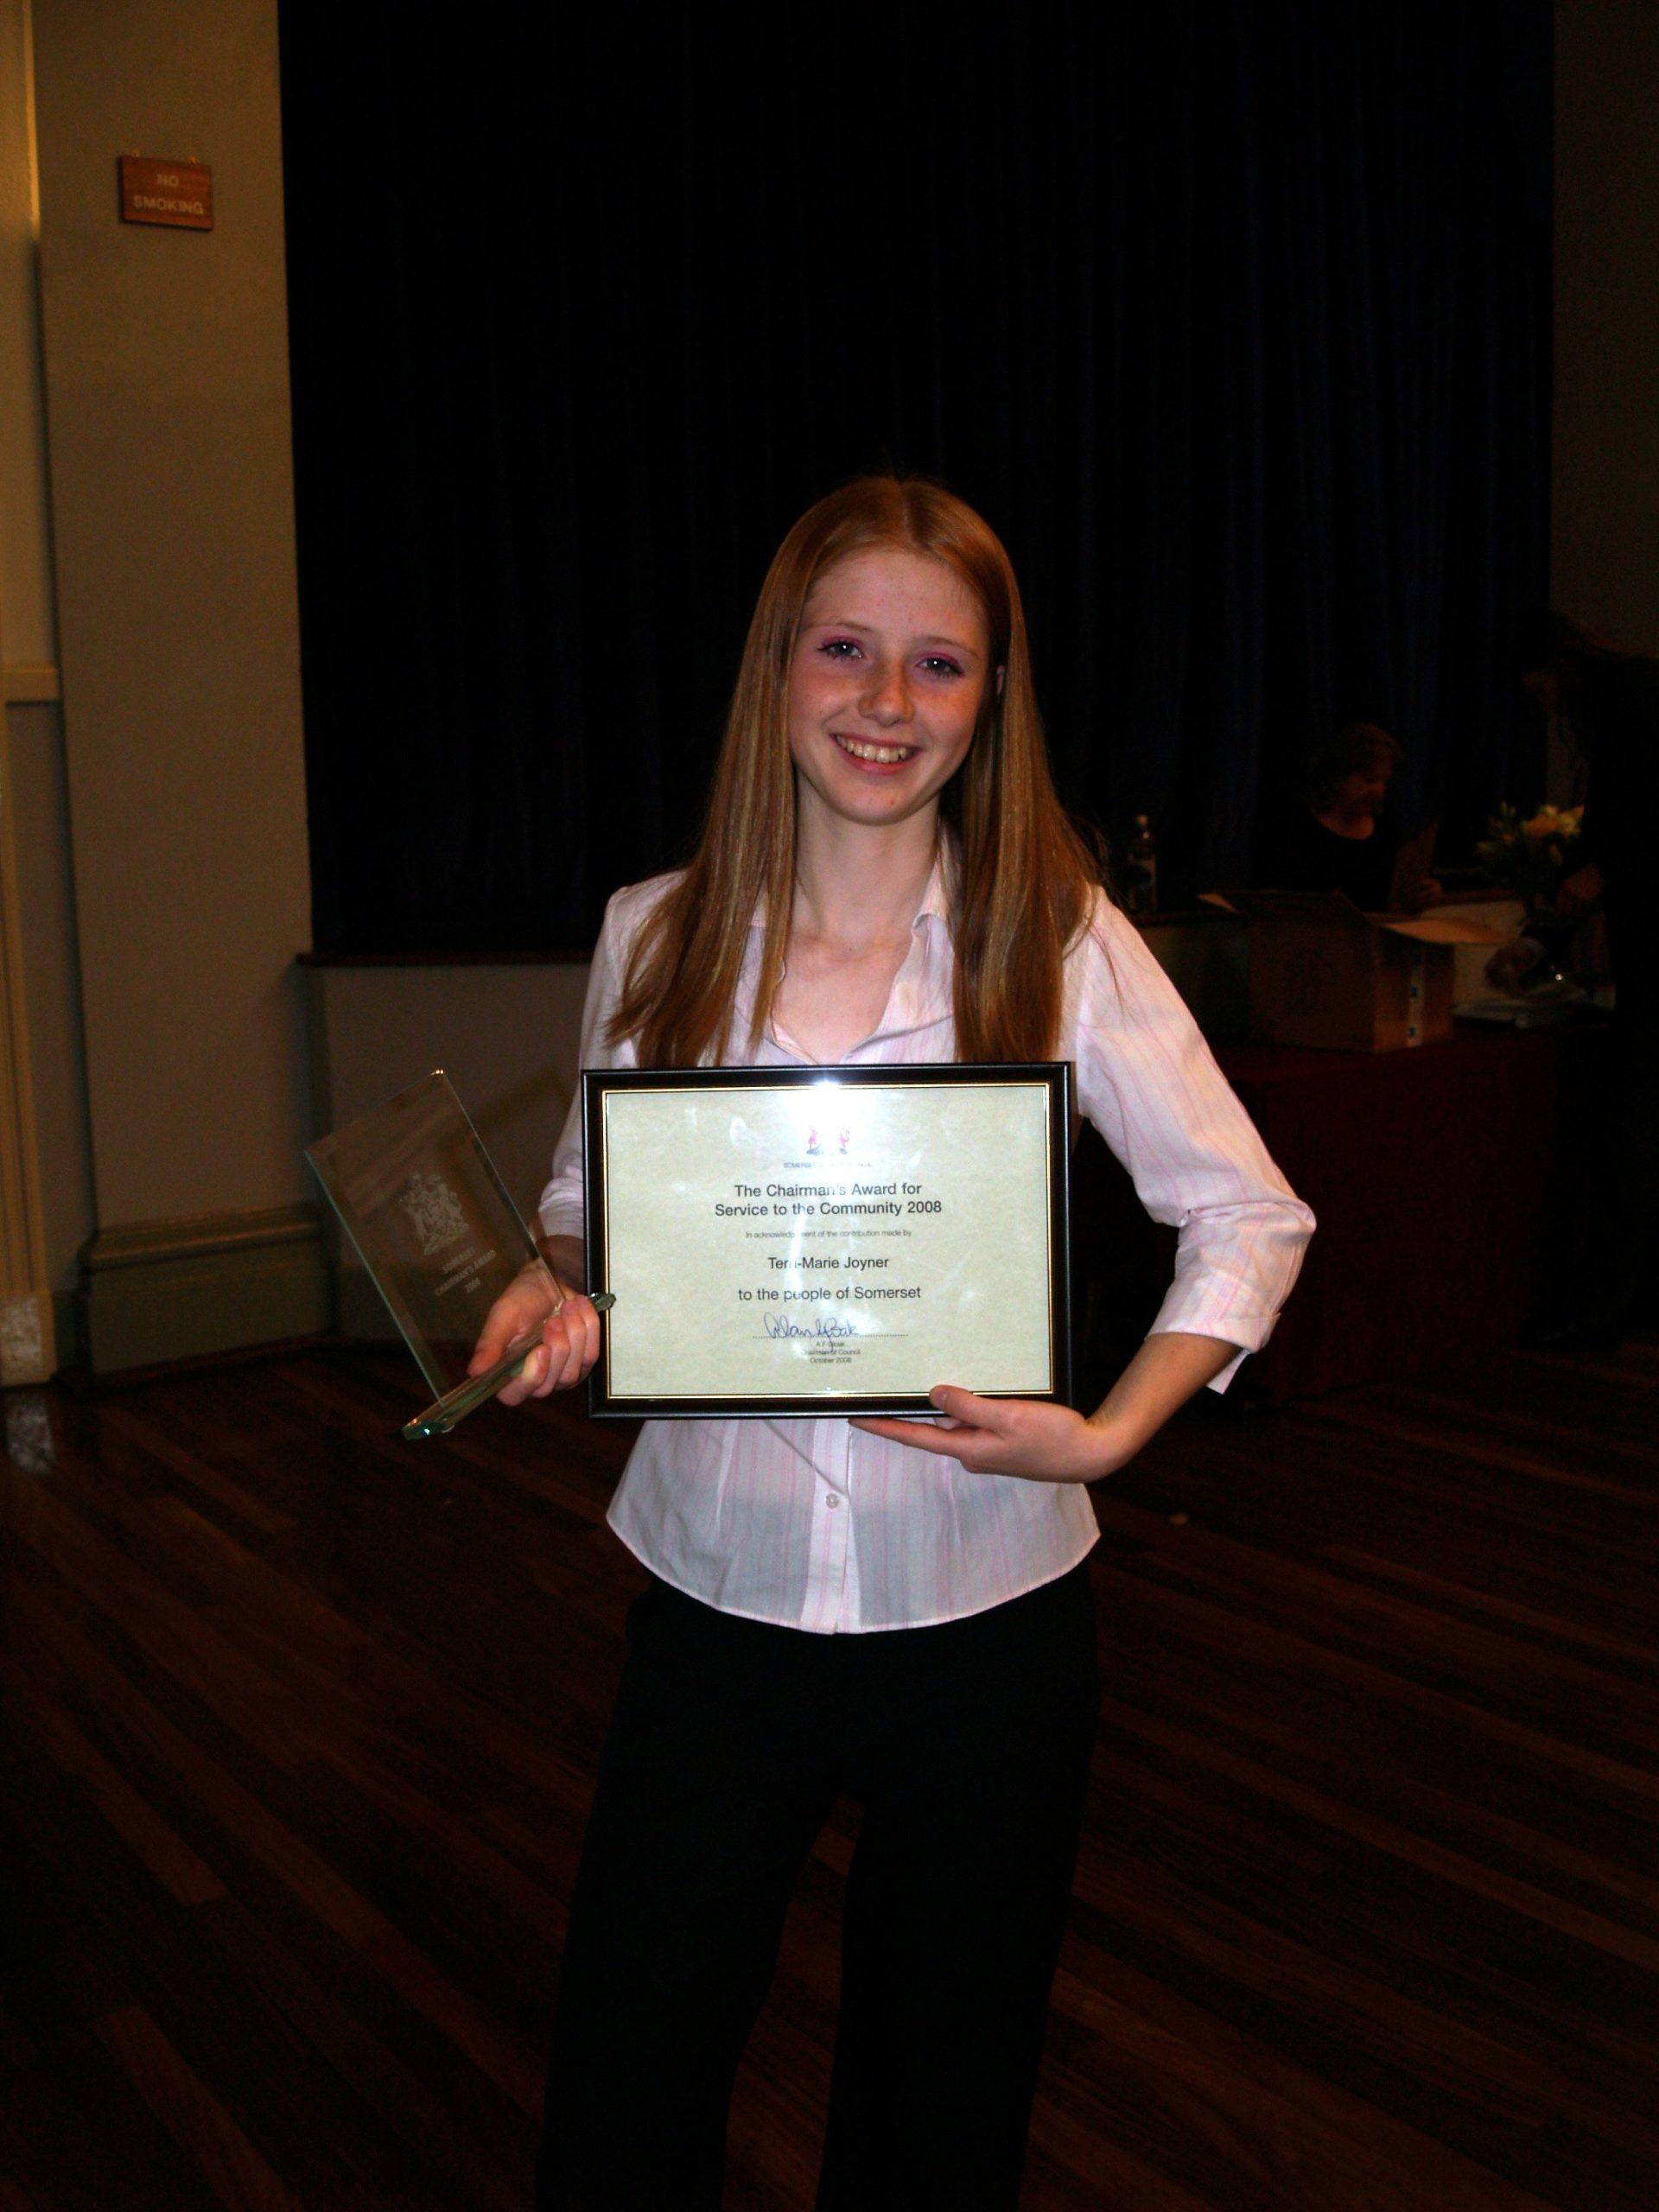 Terri - Marie Joyner & her County Award 1